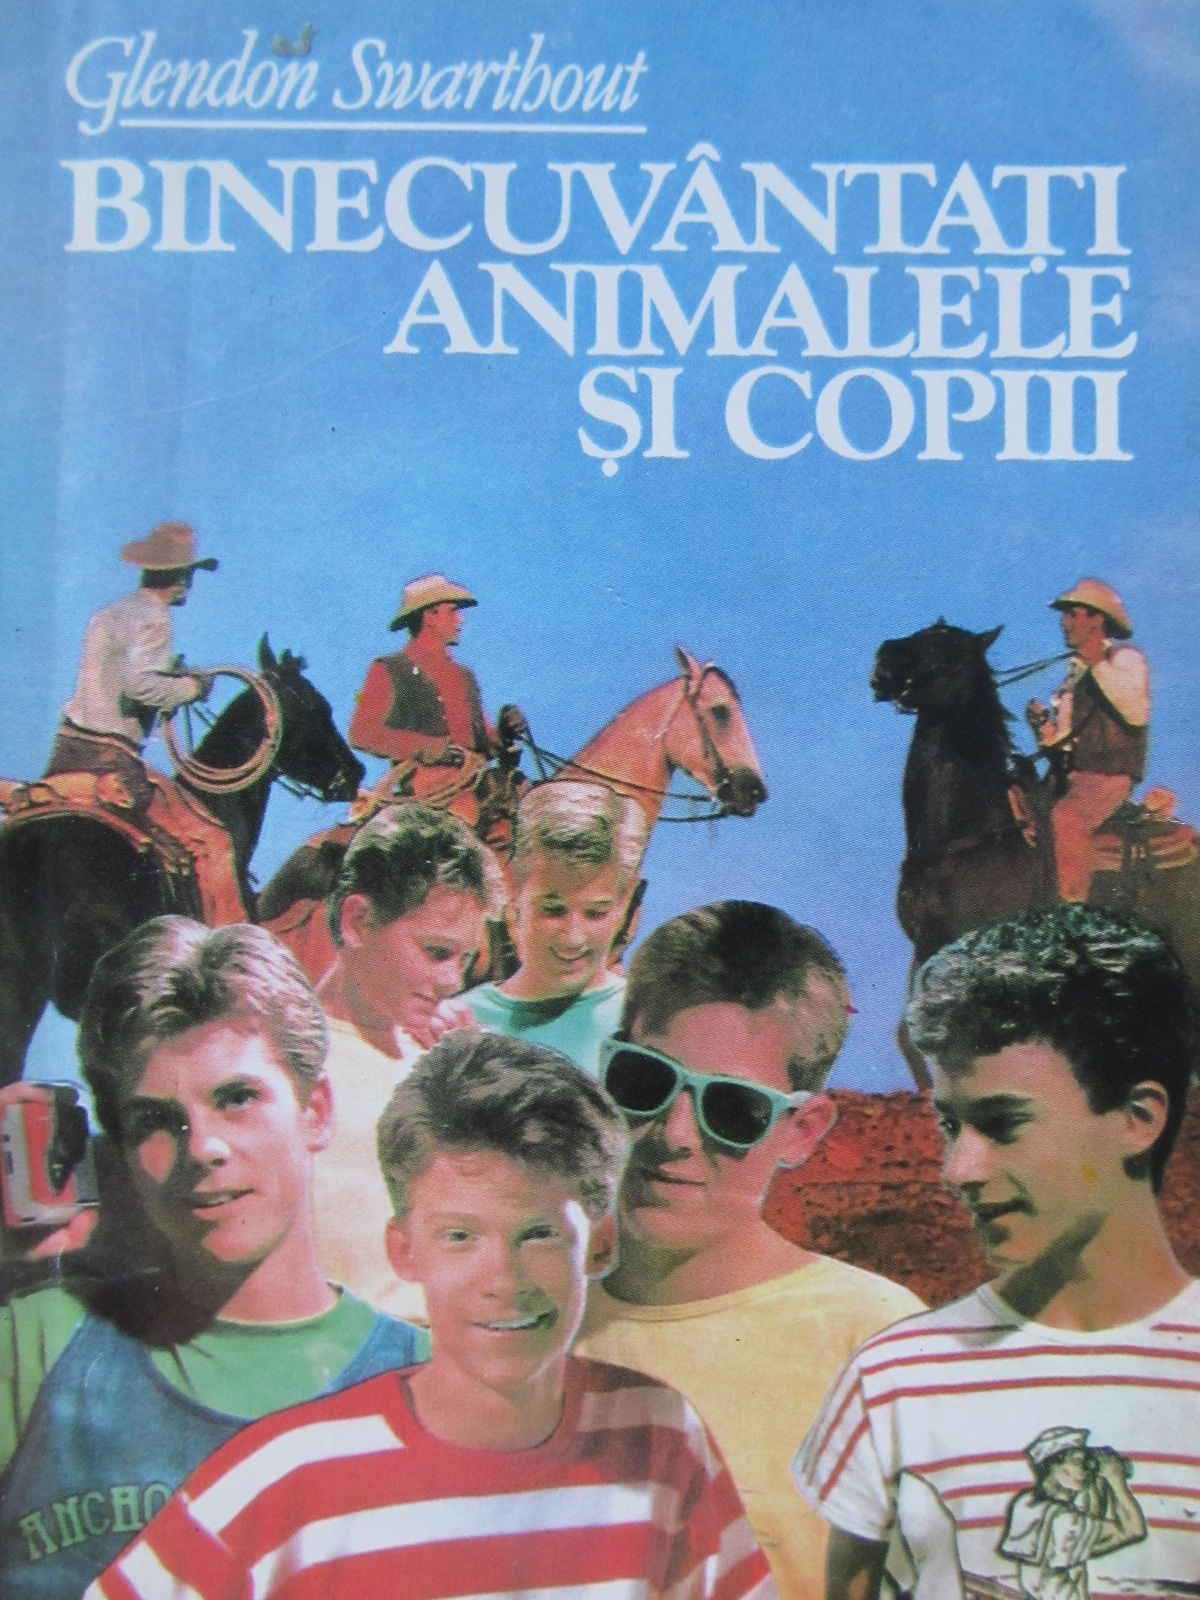 Binecuvantati animalele si copiii - Glendon Swarthout | Detalii carte